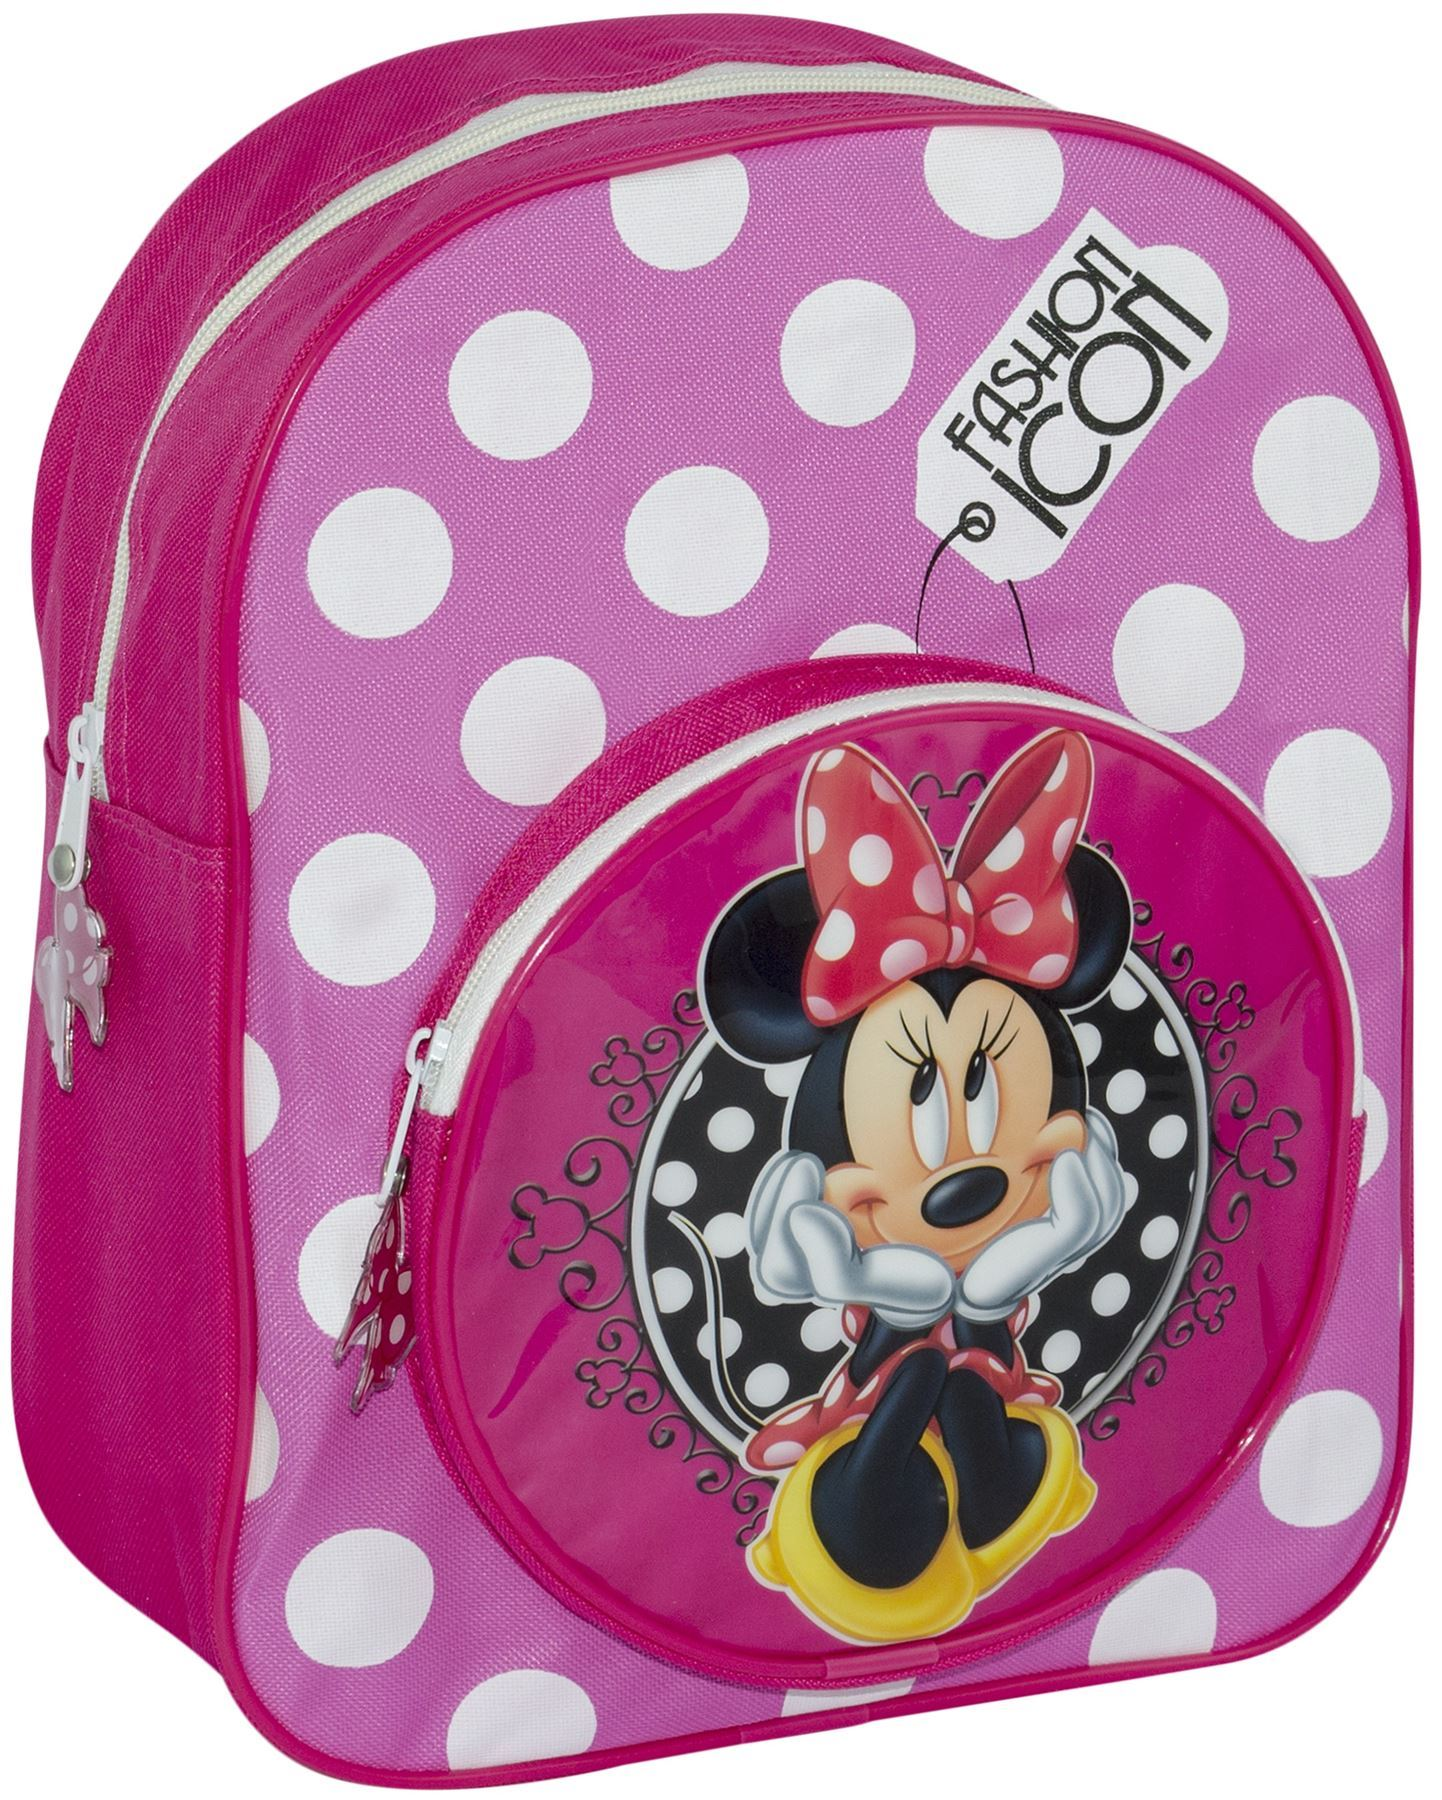 School bag new design - Boy Girl Official Disney Minnie Amp Mickey Mouse